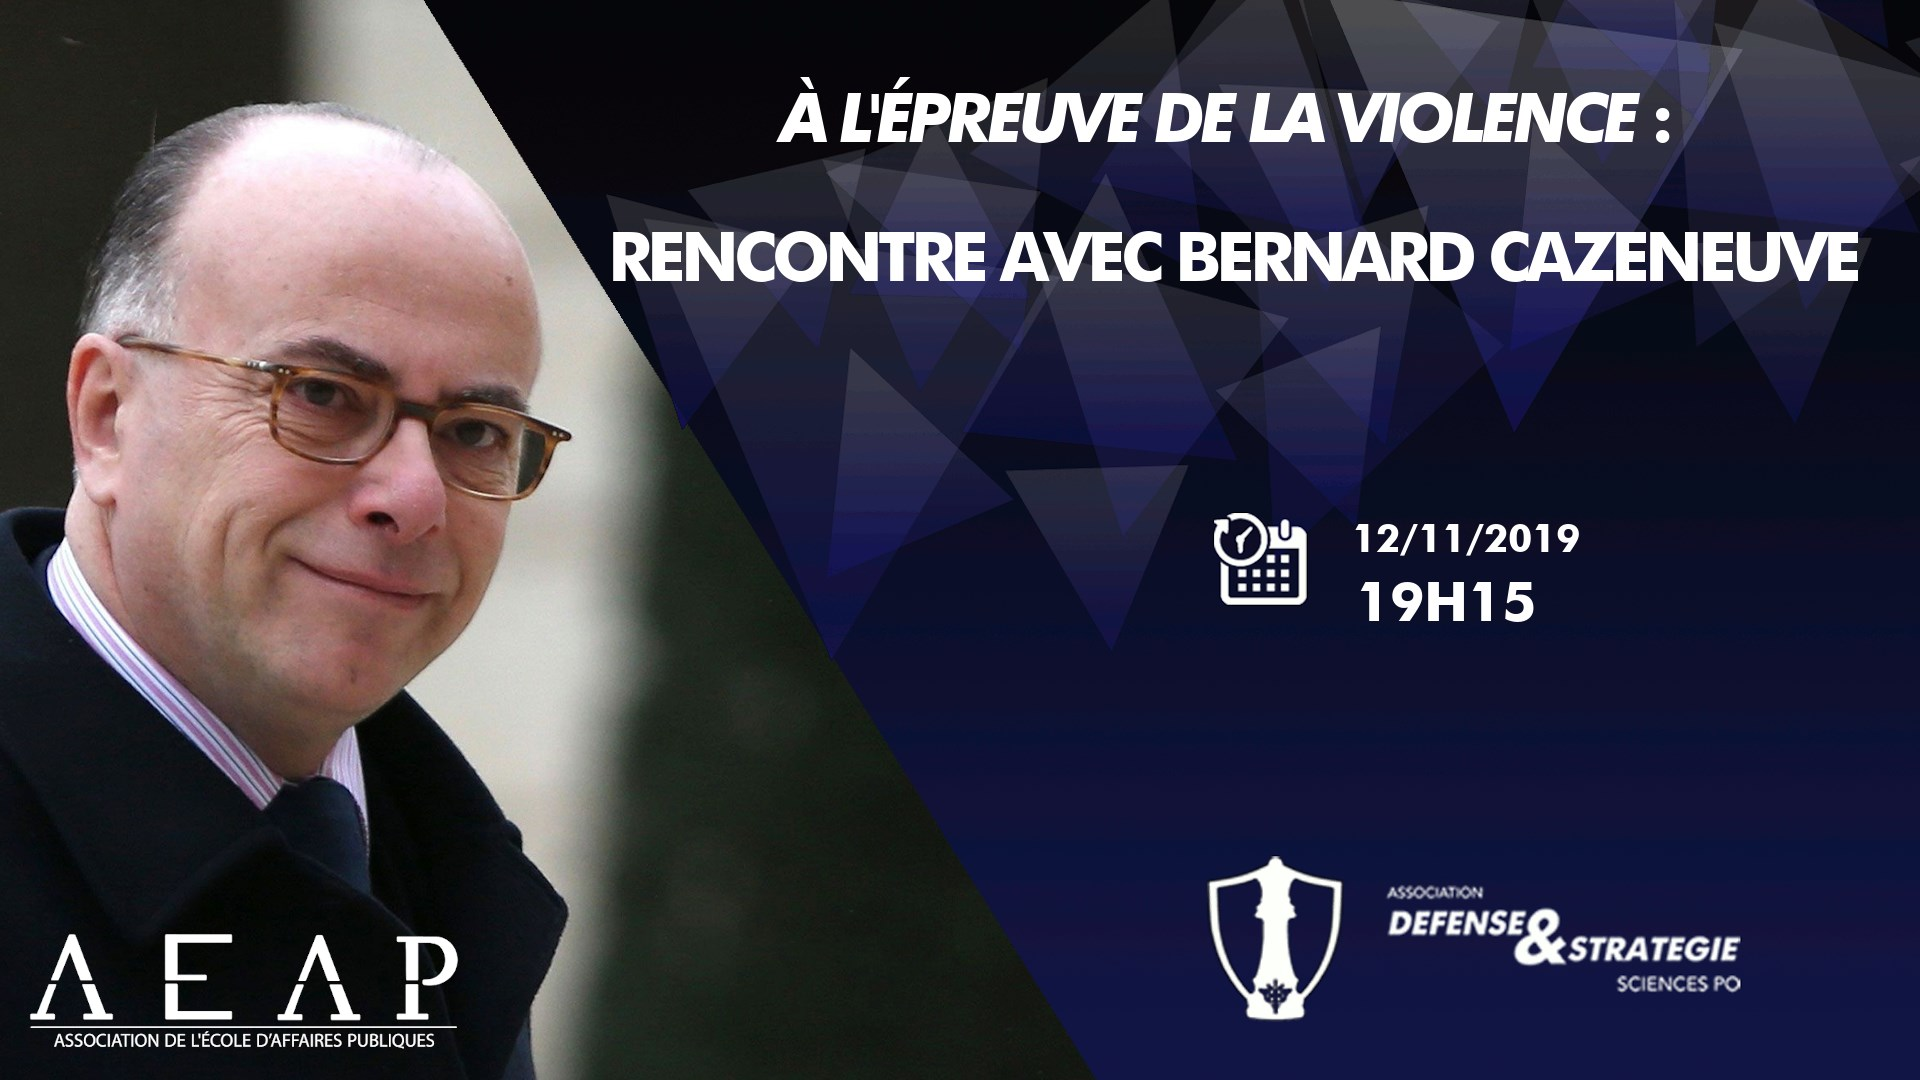 Conférence avec Bernard Cazeneuve : A l'épreuve de la violence